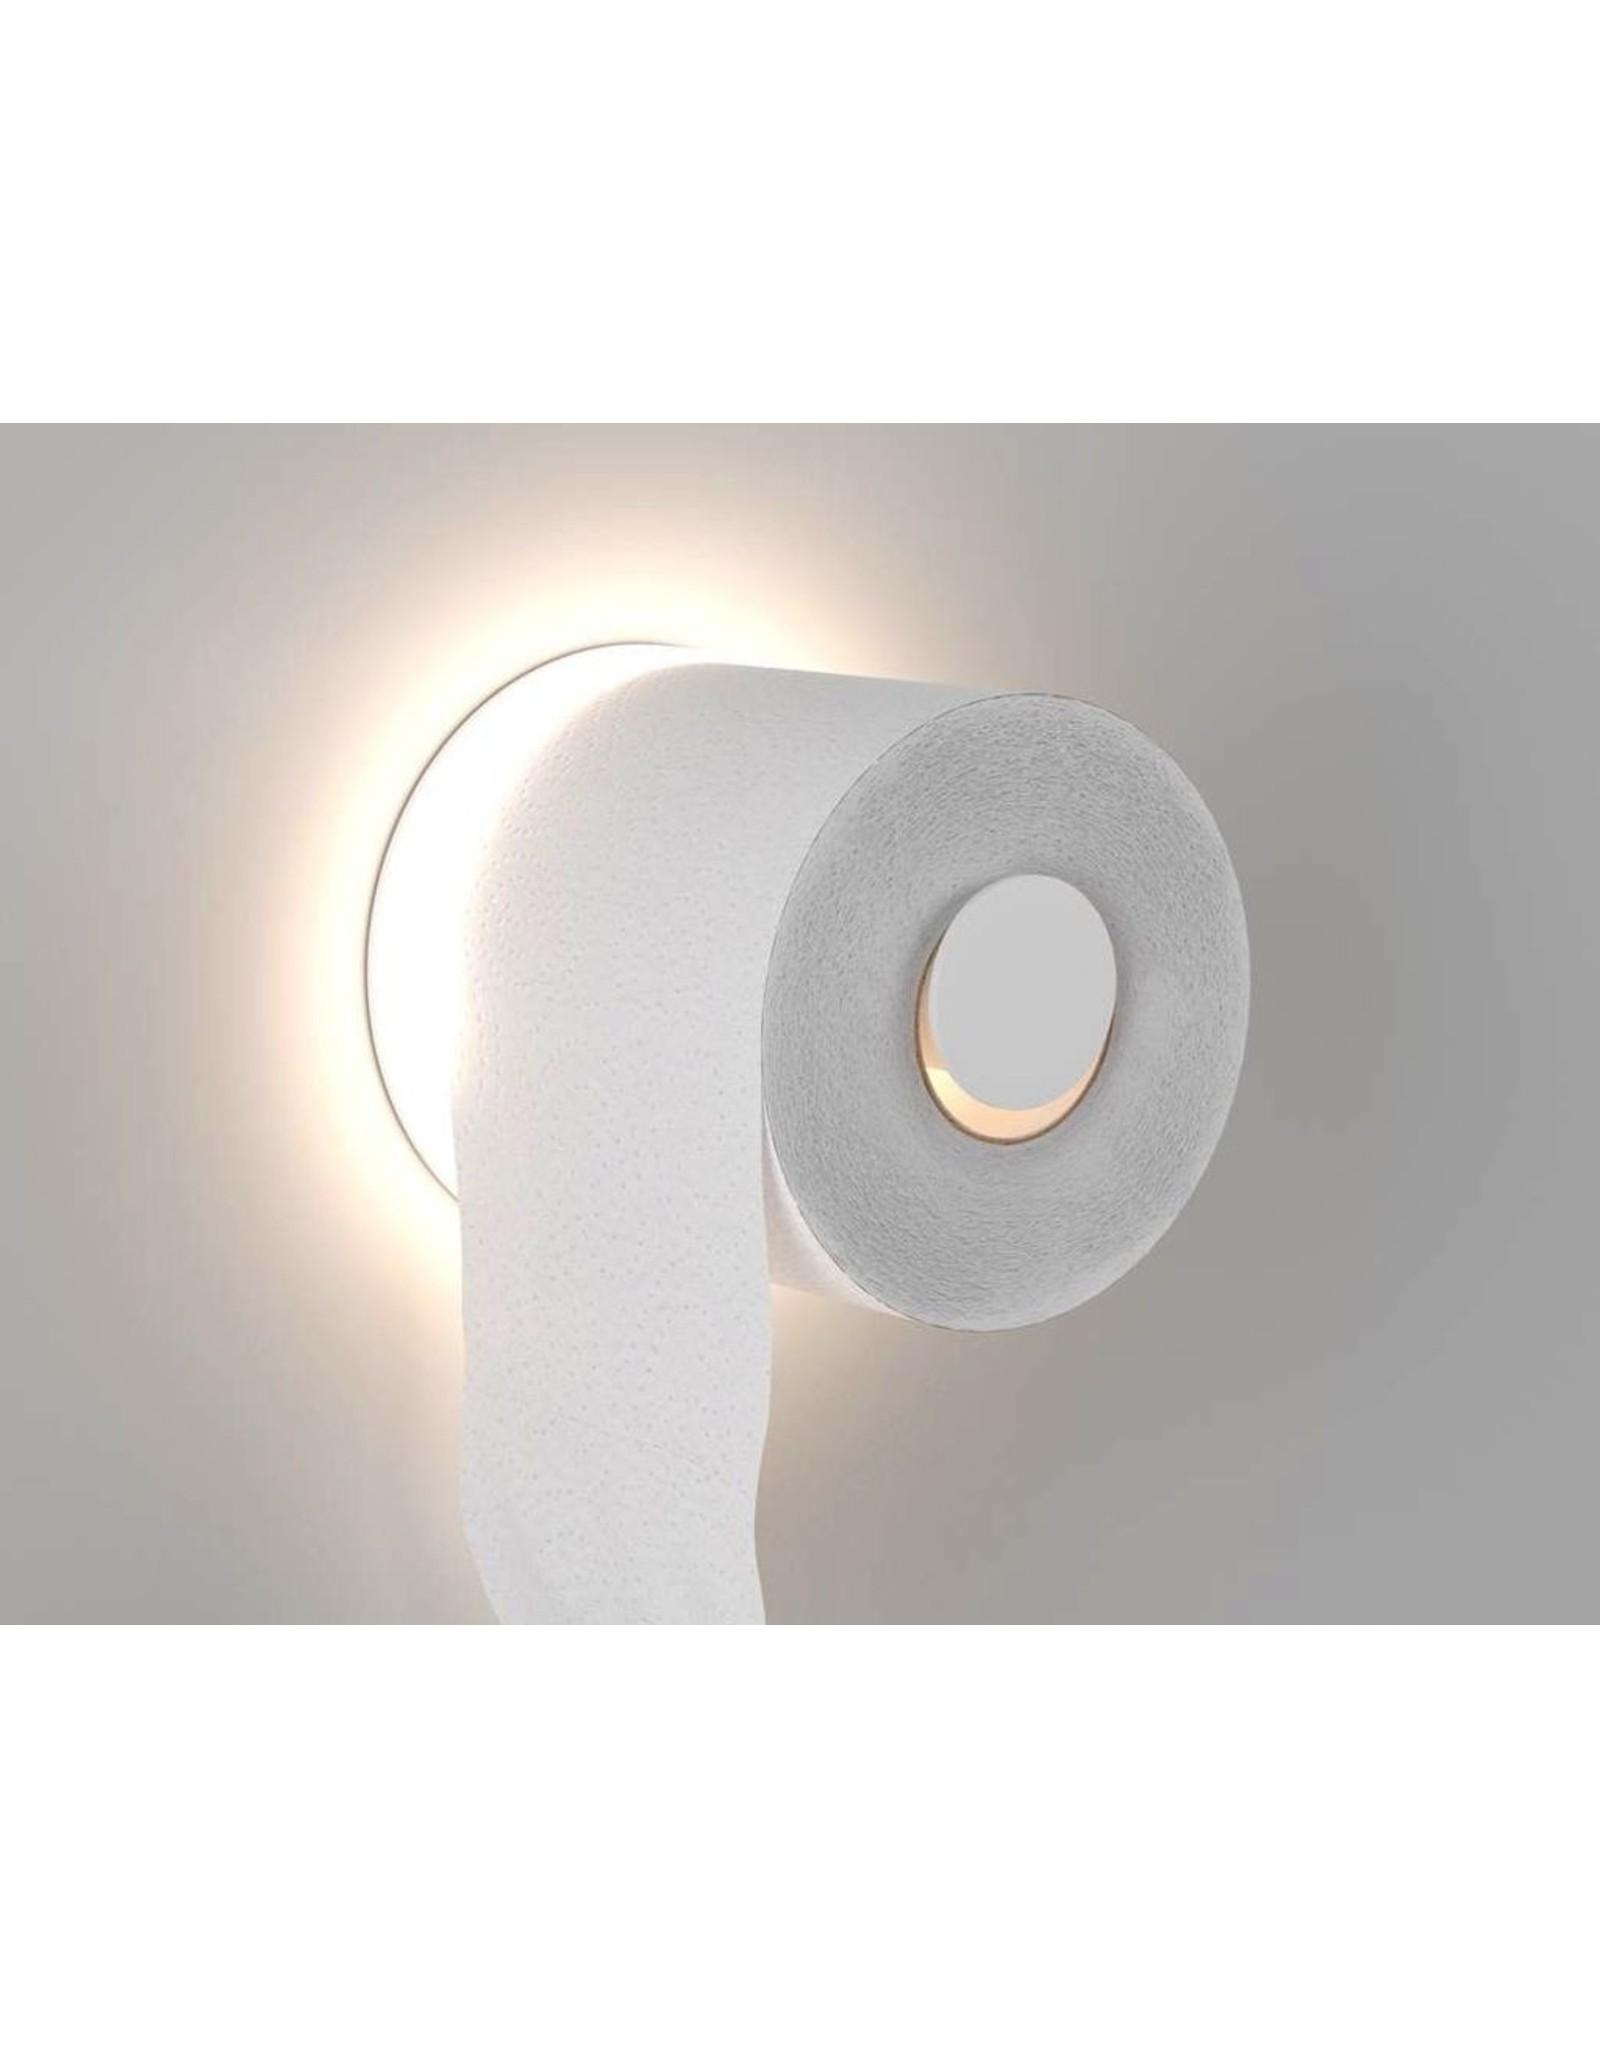 DARK at night nv L-HOP 2 WHITE LED 3000K/3W